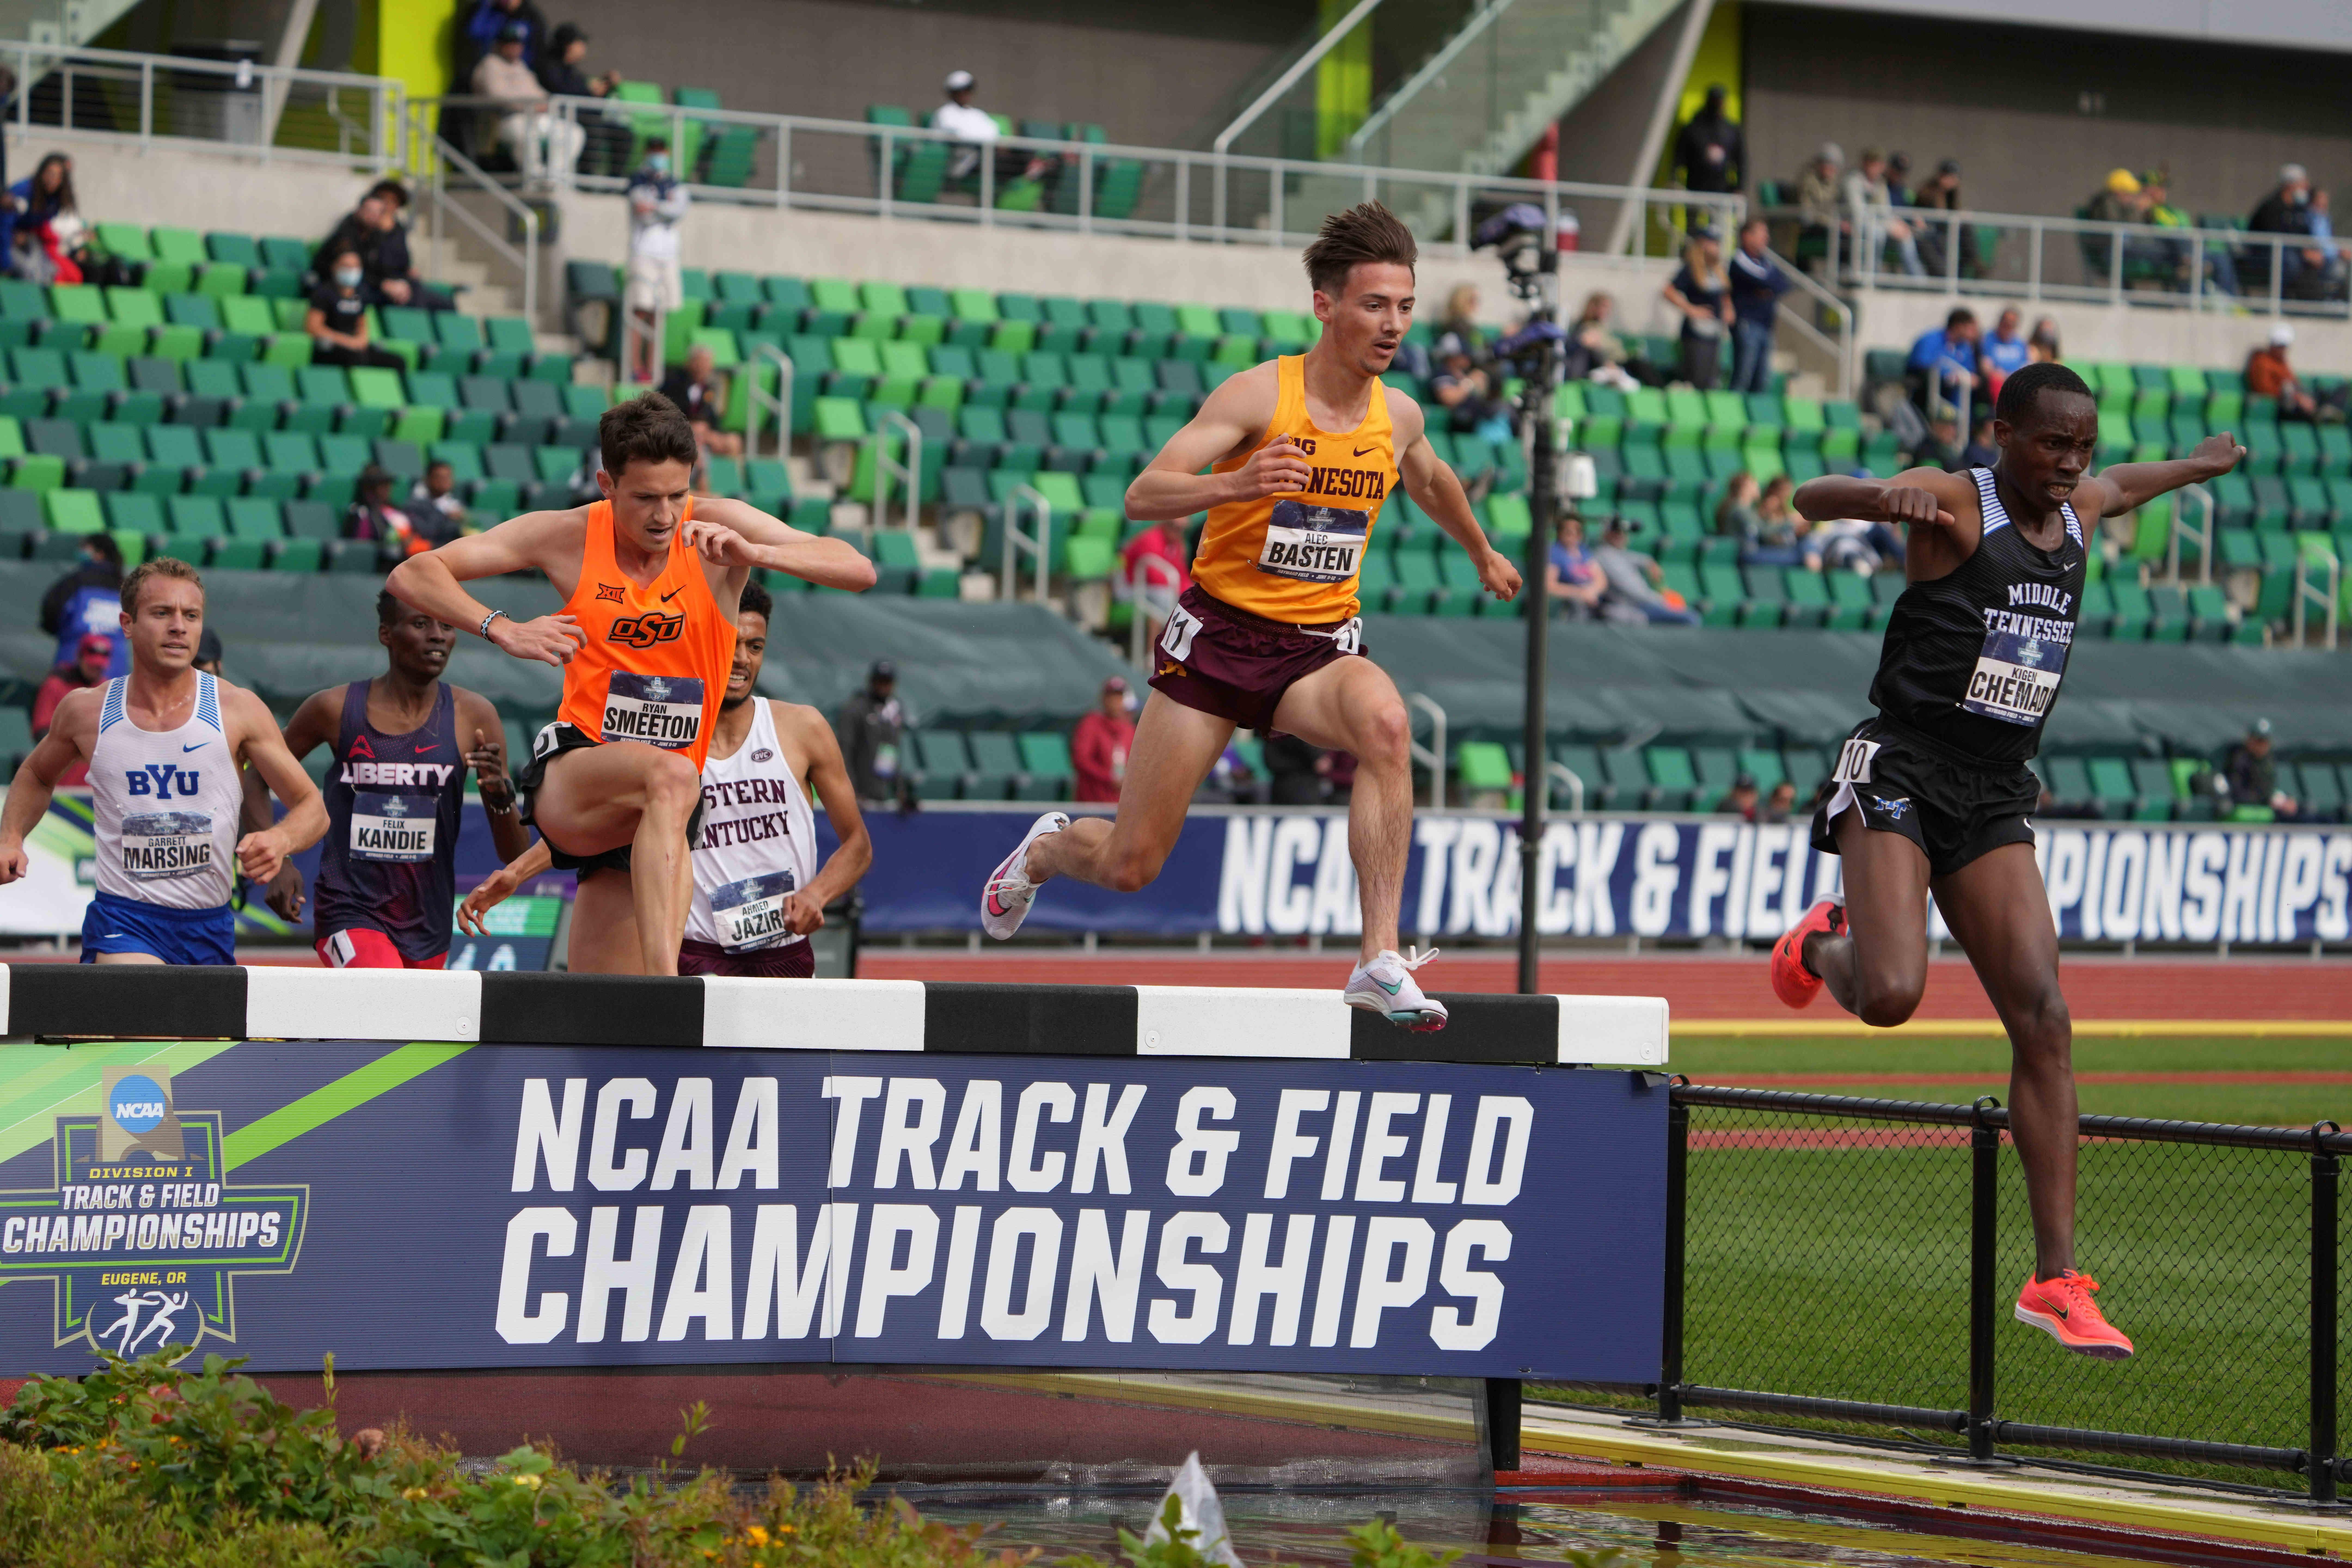 Track & Field: NCAA Championships